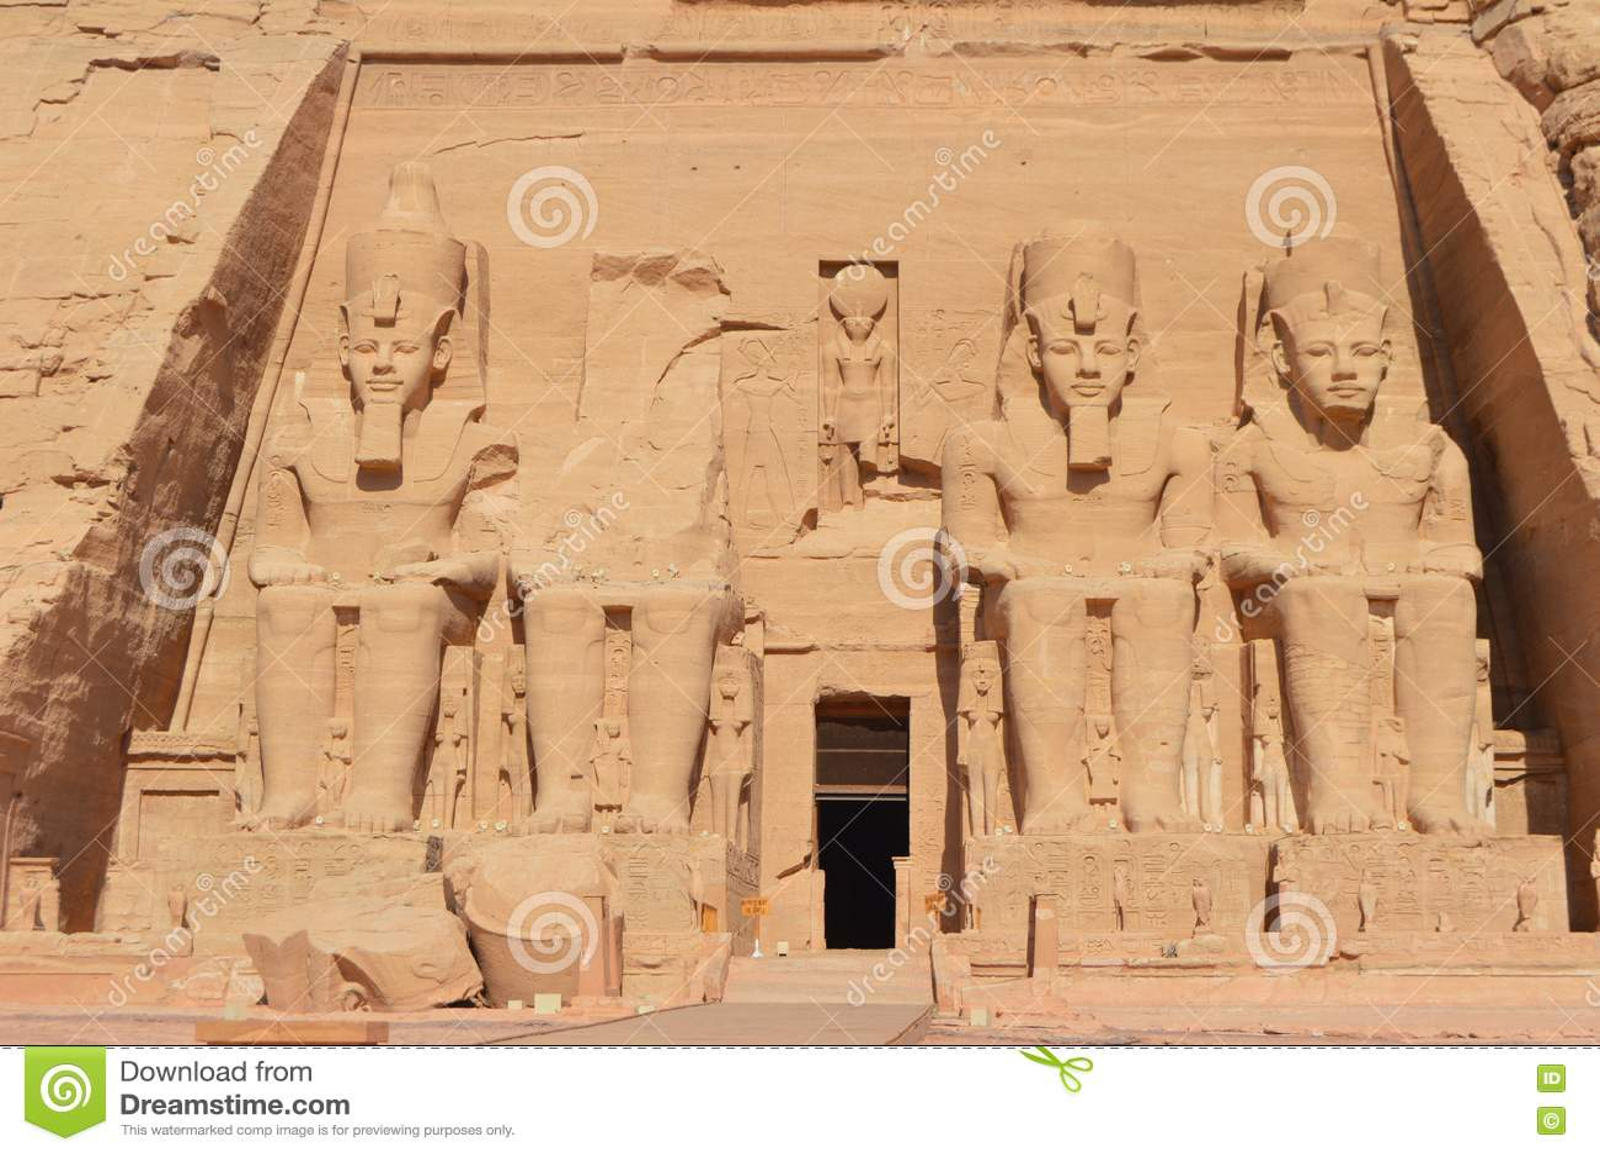 Het indrukwekkende oude monument in Abu Simbel